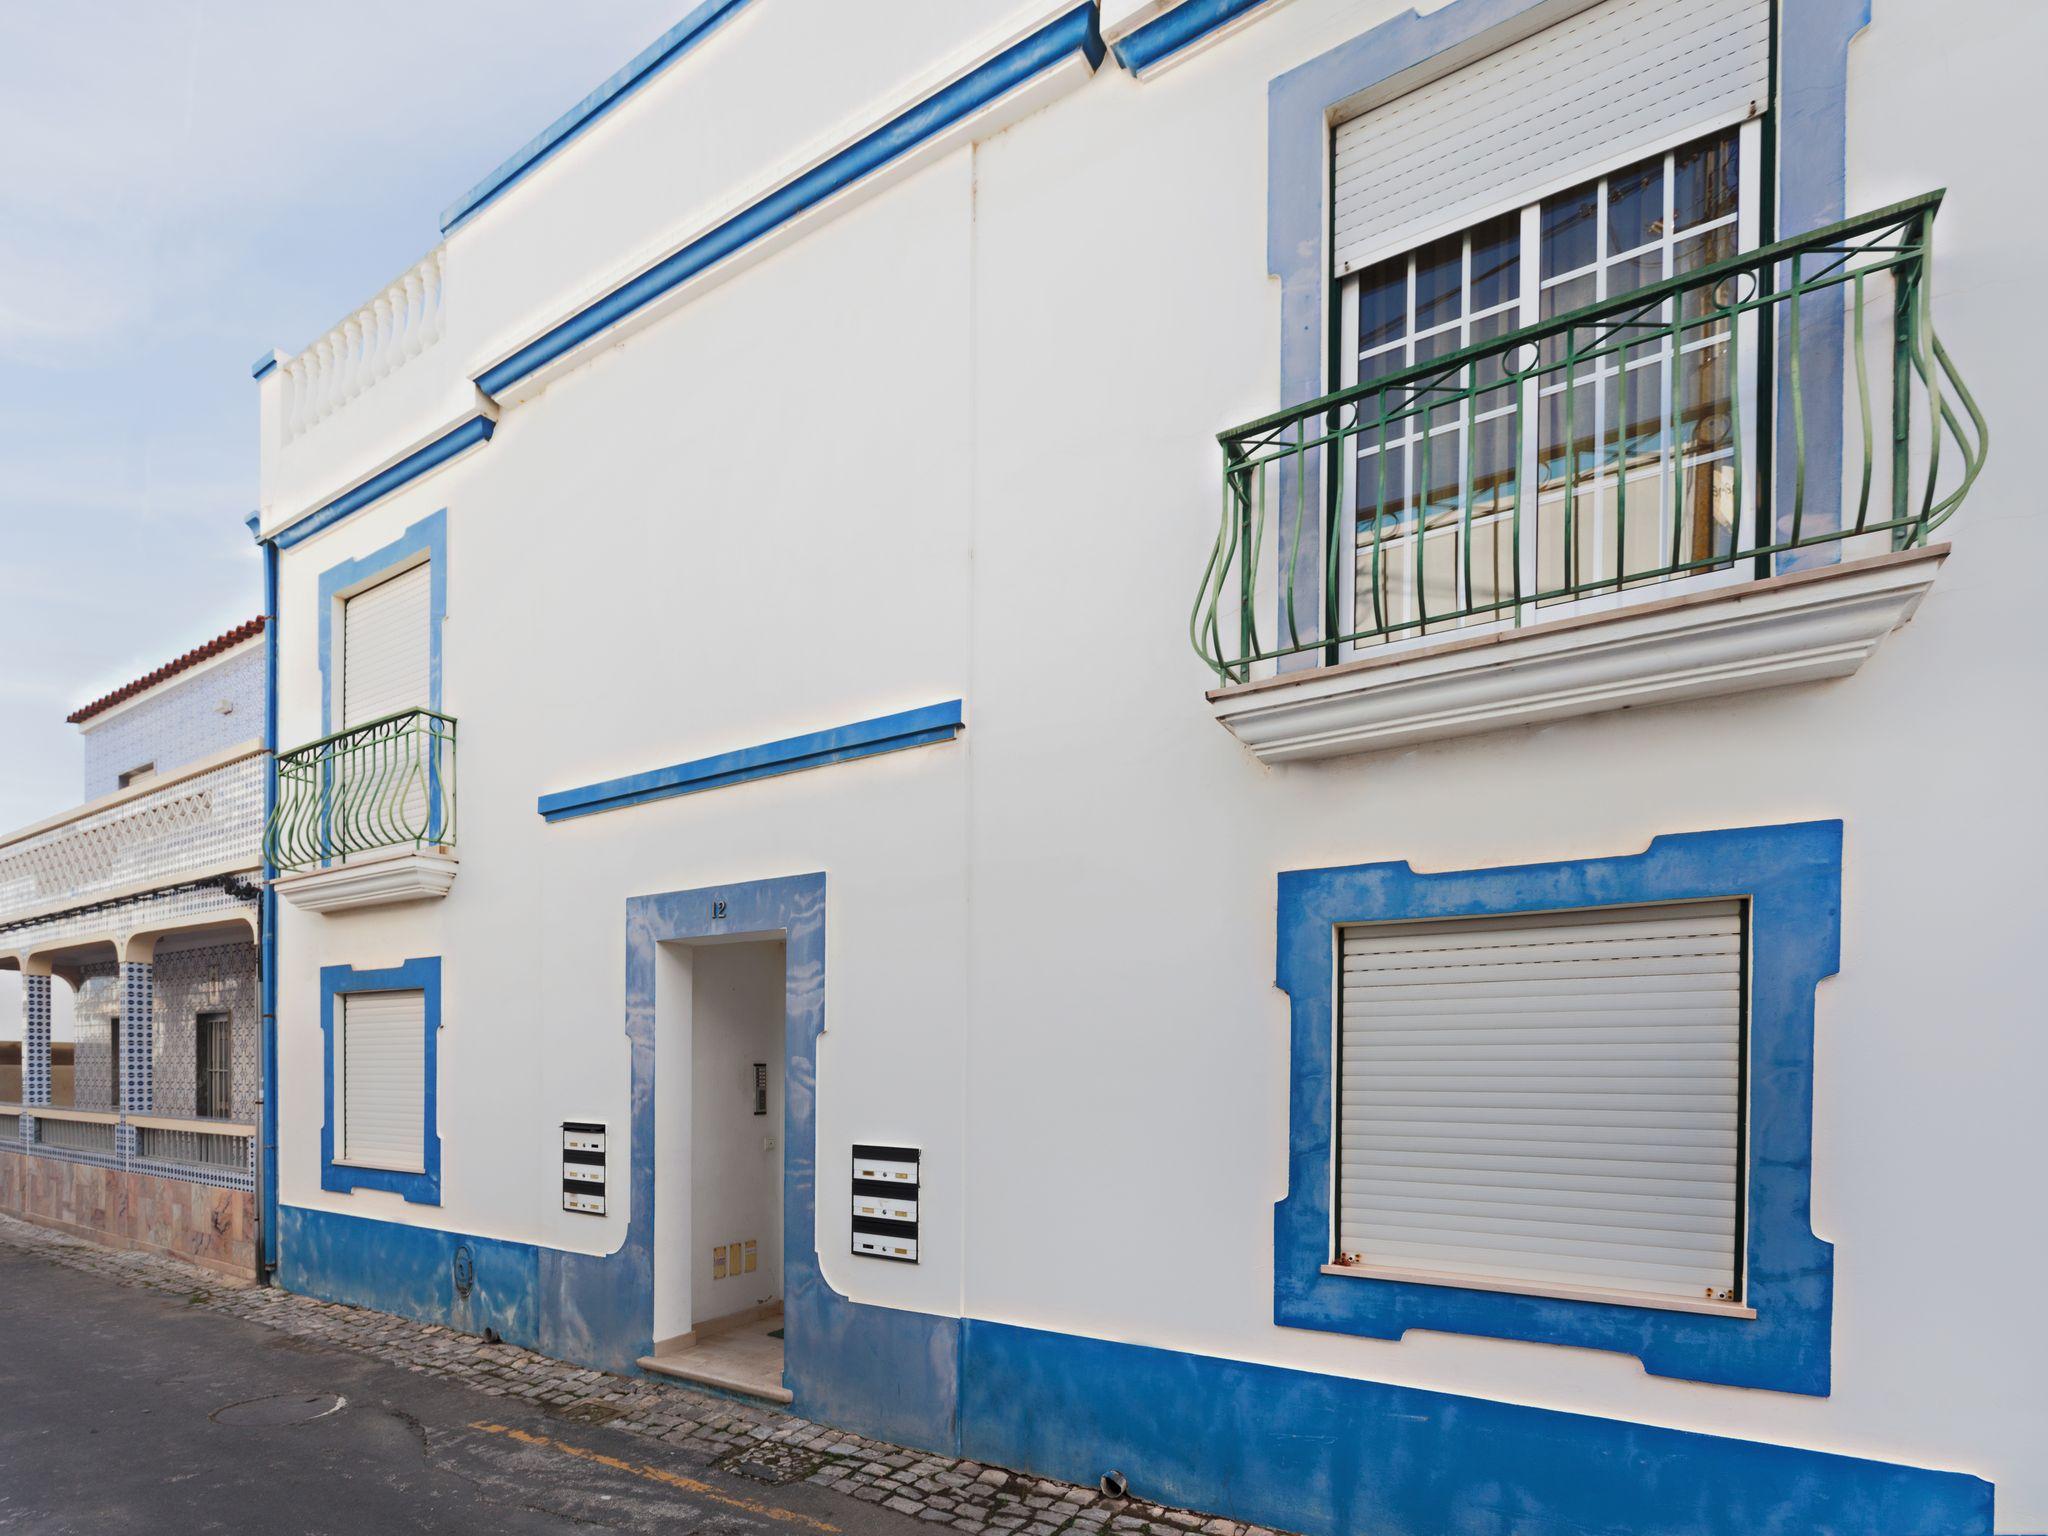 Cabanas Beach Apartment by My Choice, Alcoutim